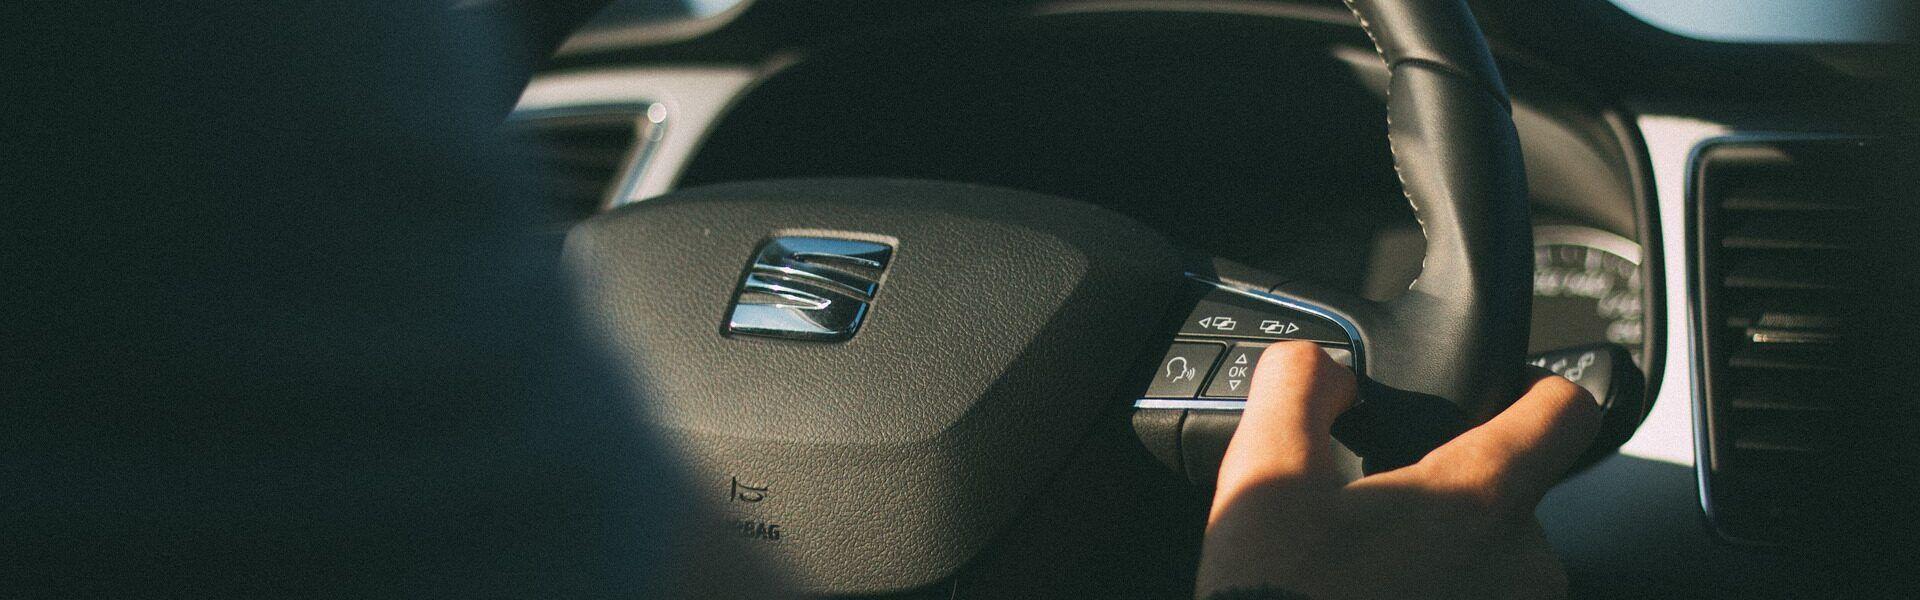 conectar-móvil-coche-bluetooth